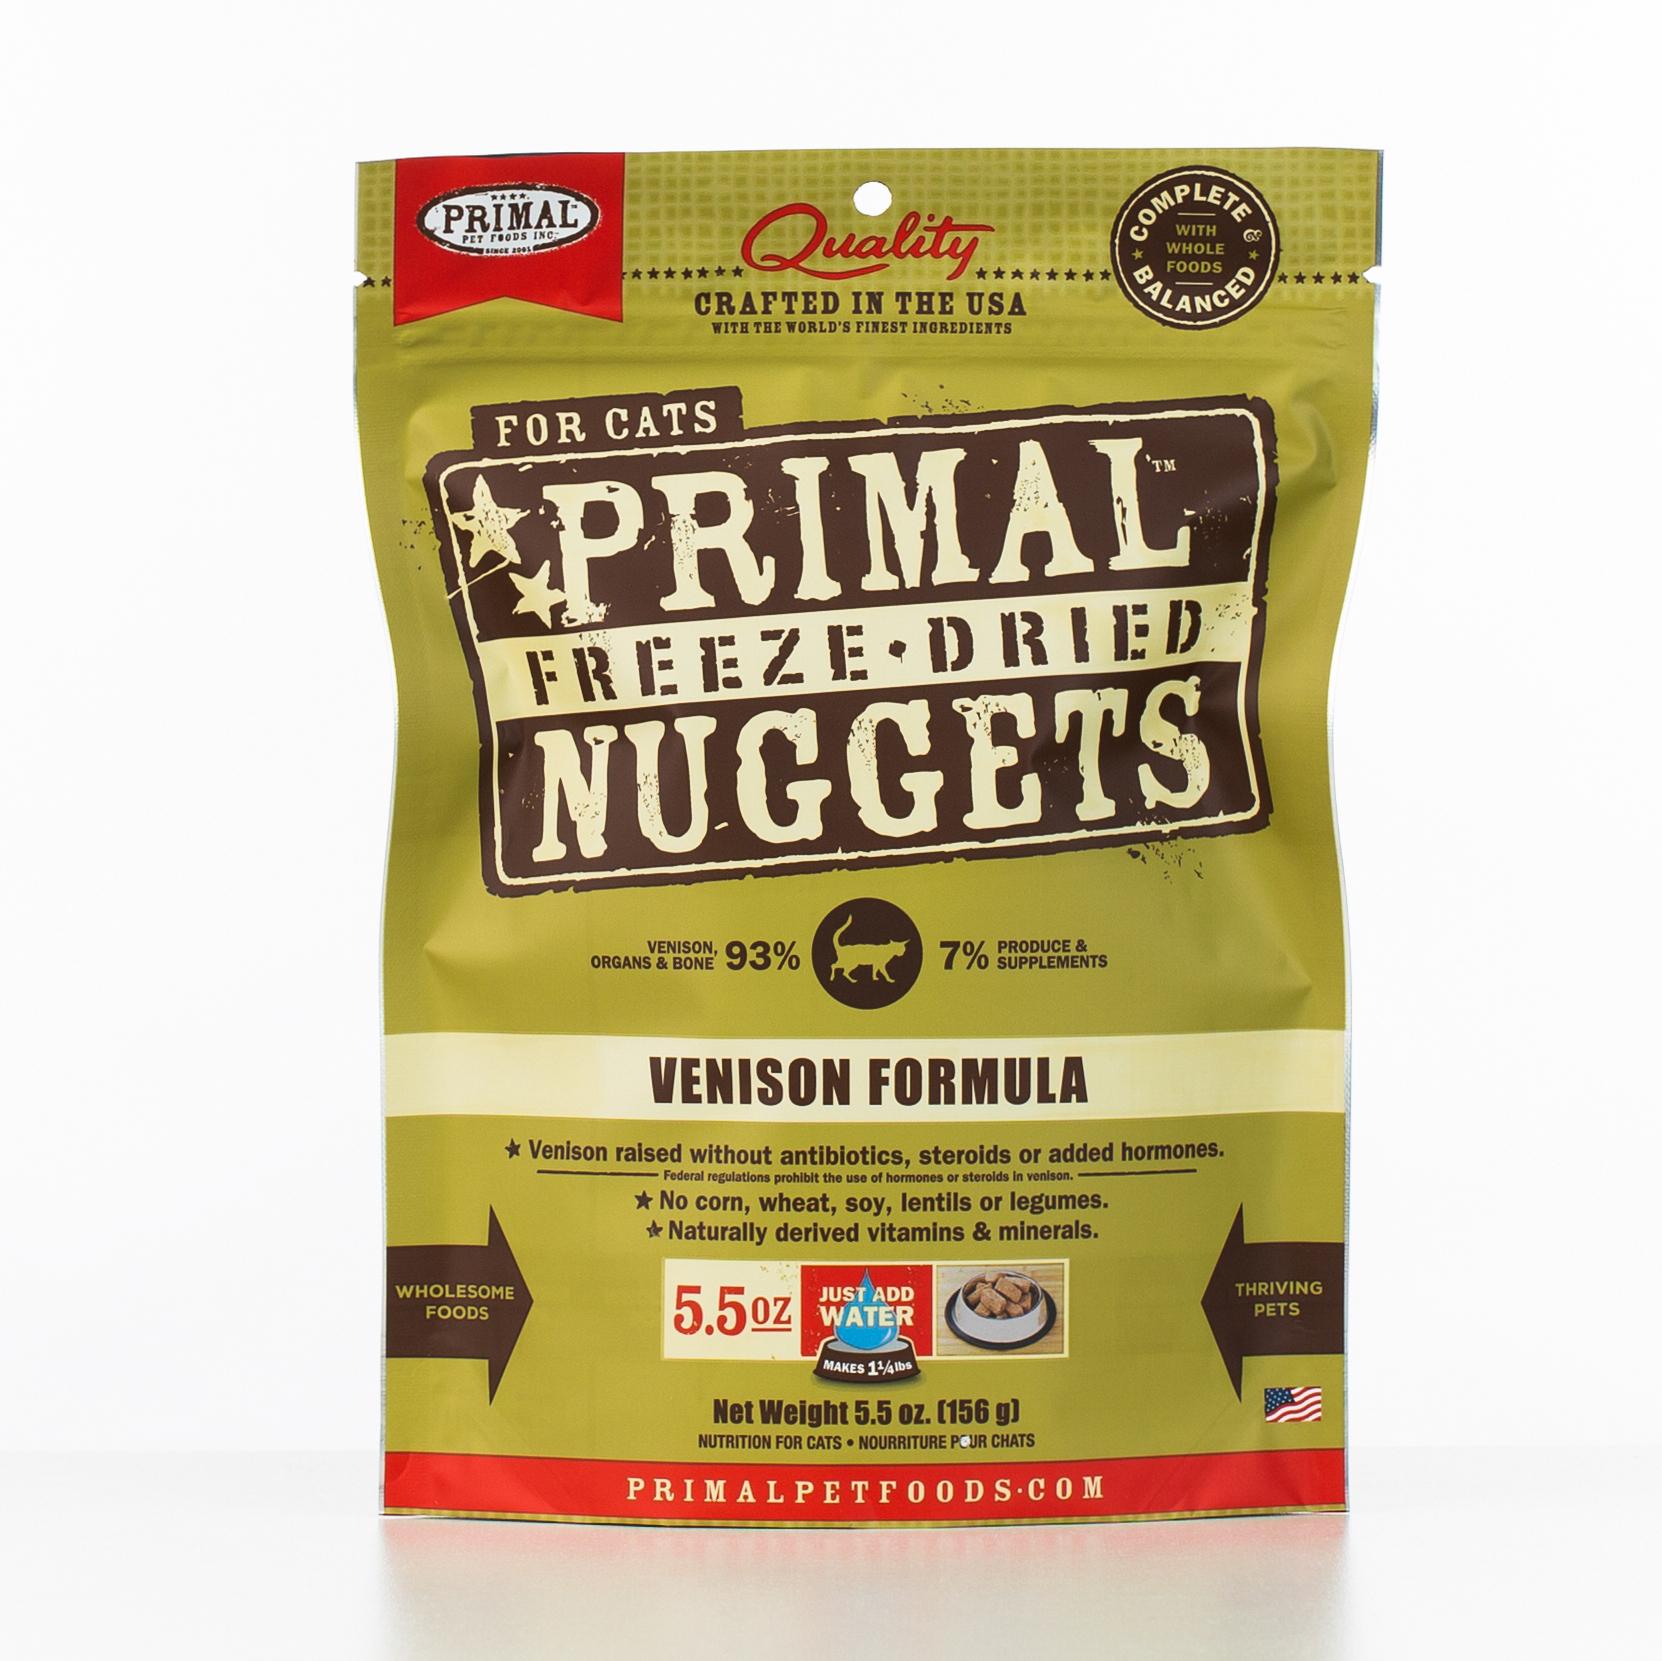 Primal Raw Freeze-Dried Nuggets Venison Formula Cat Food, 5.5-oz bag